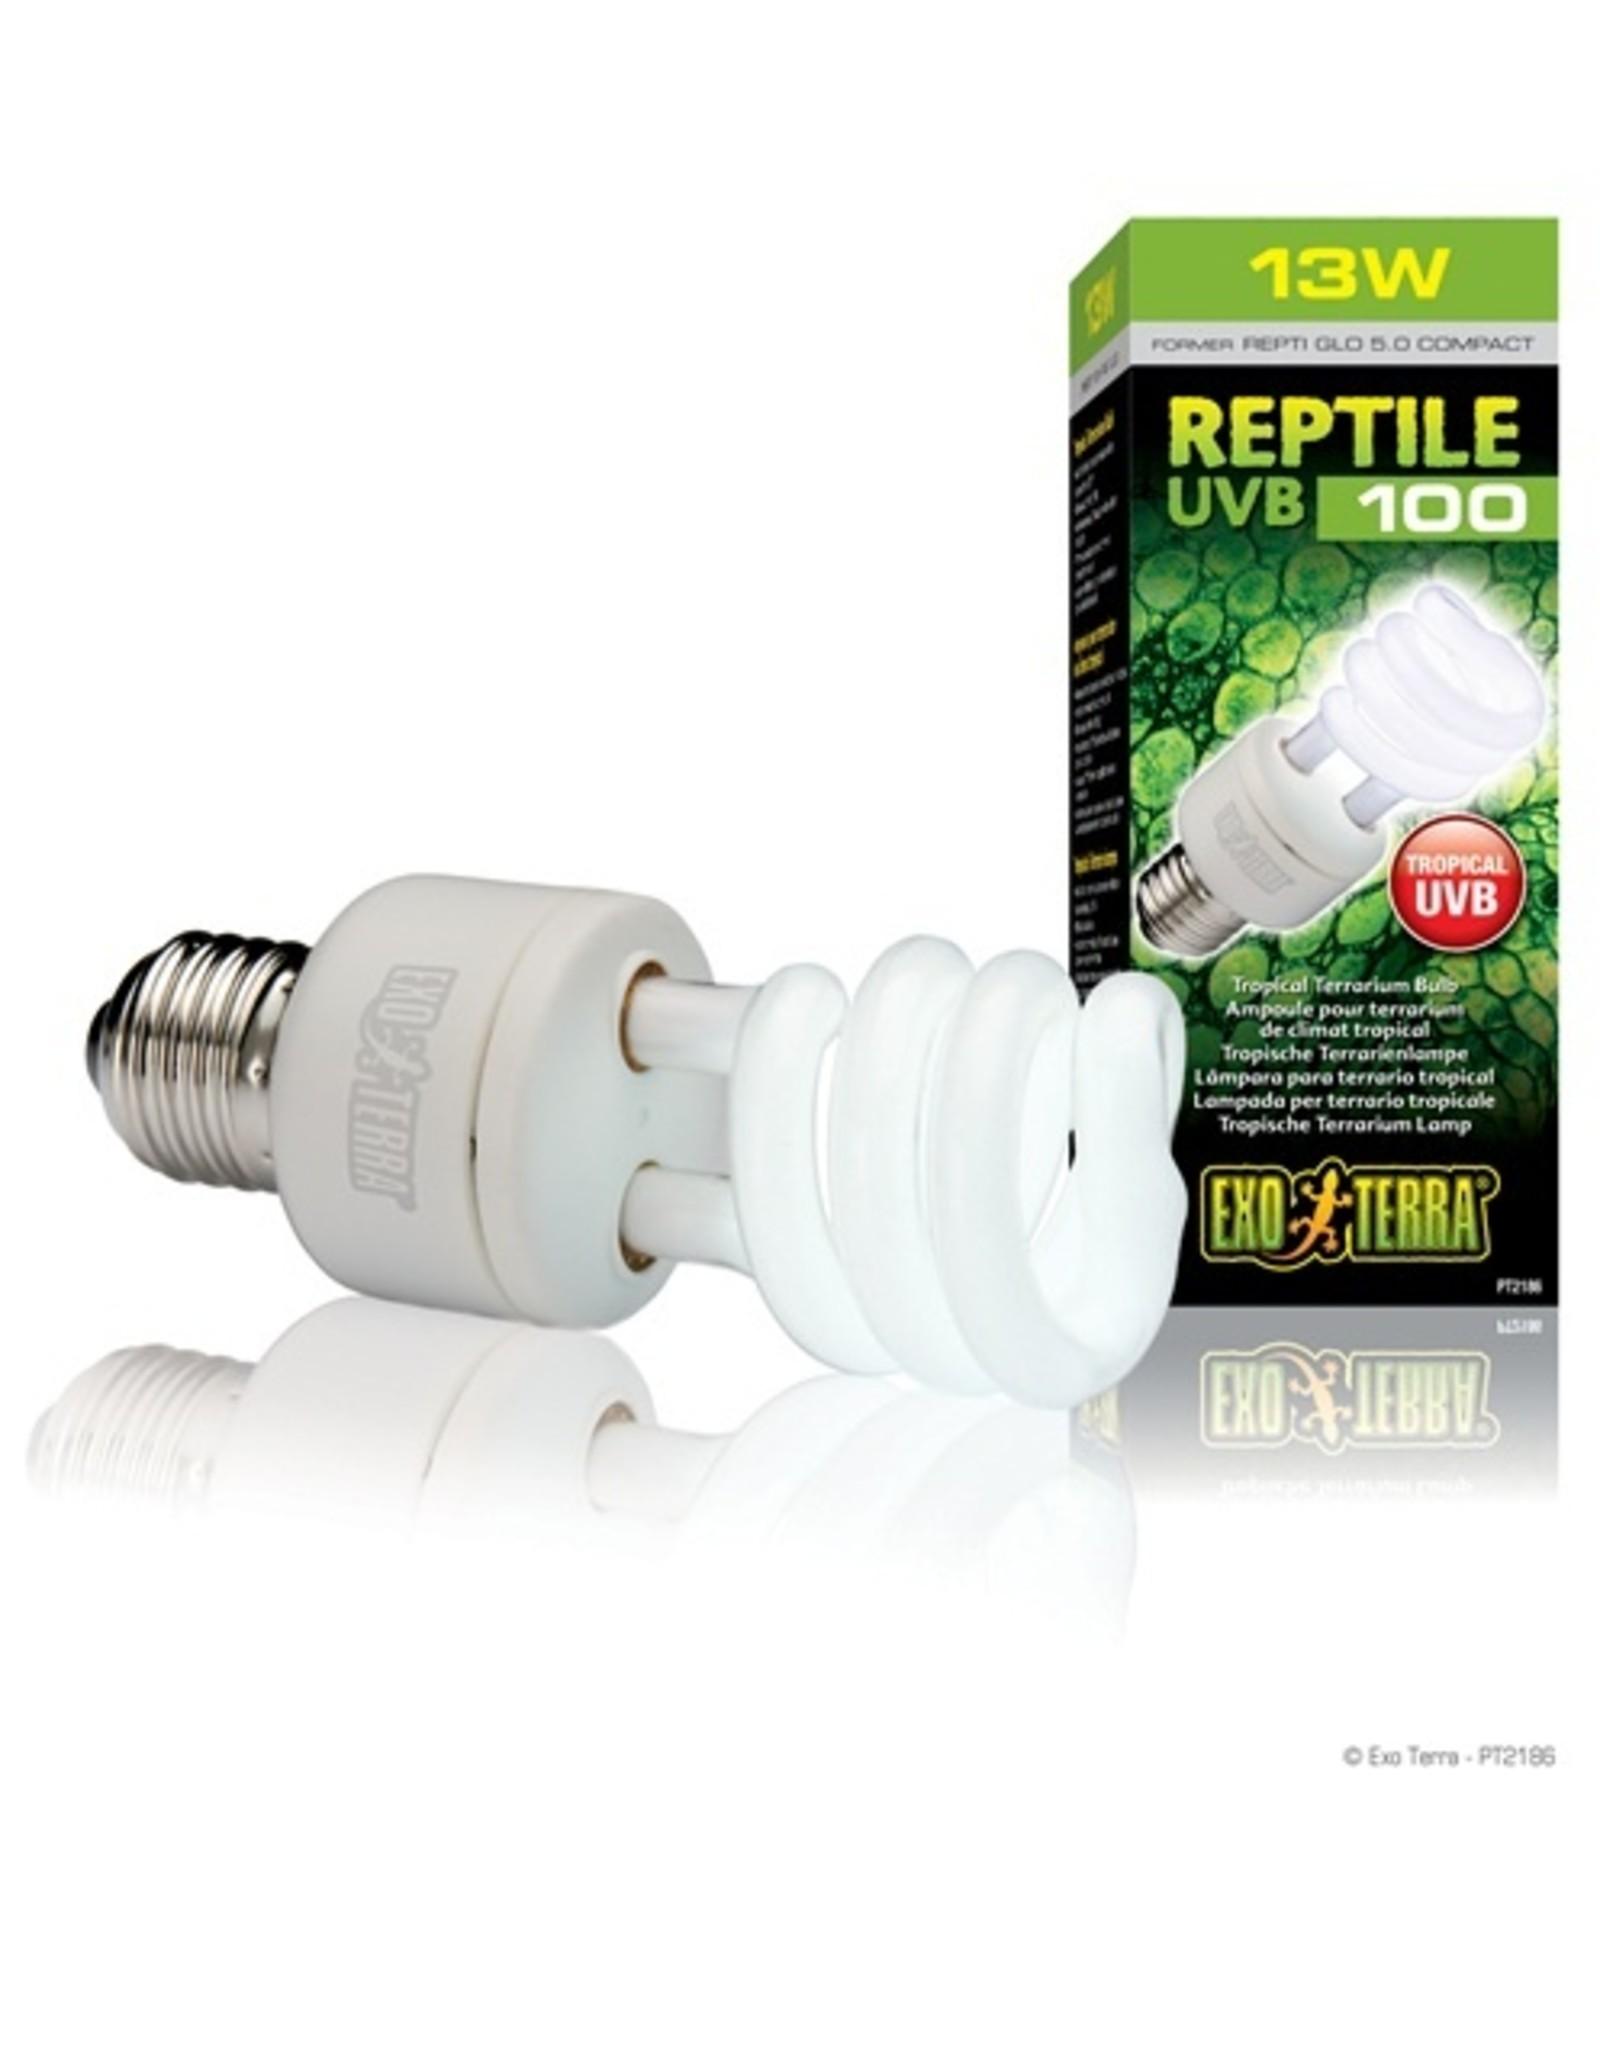 Exo Terra EXO TERRA UVB 100 Tropical Terrerium Bulb 110V